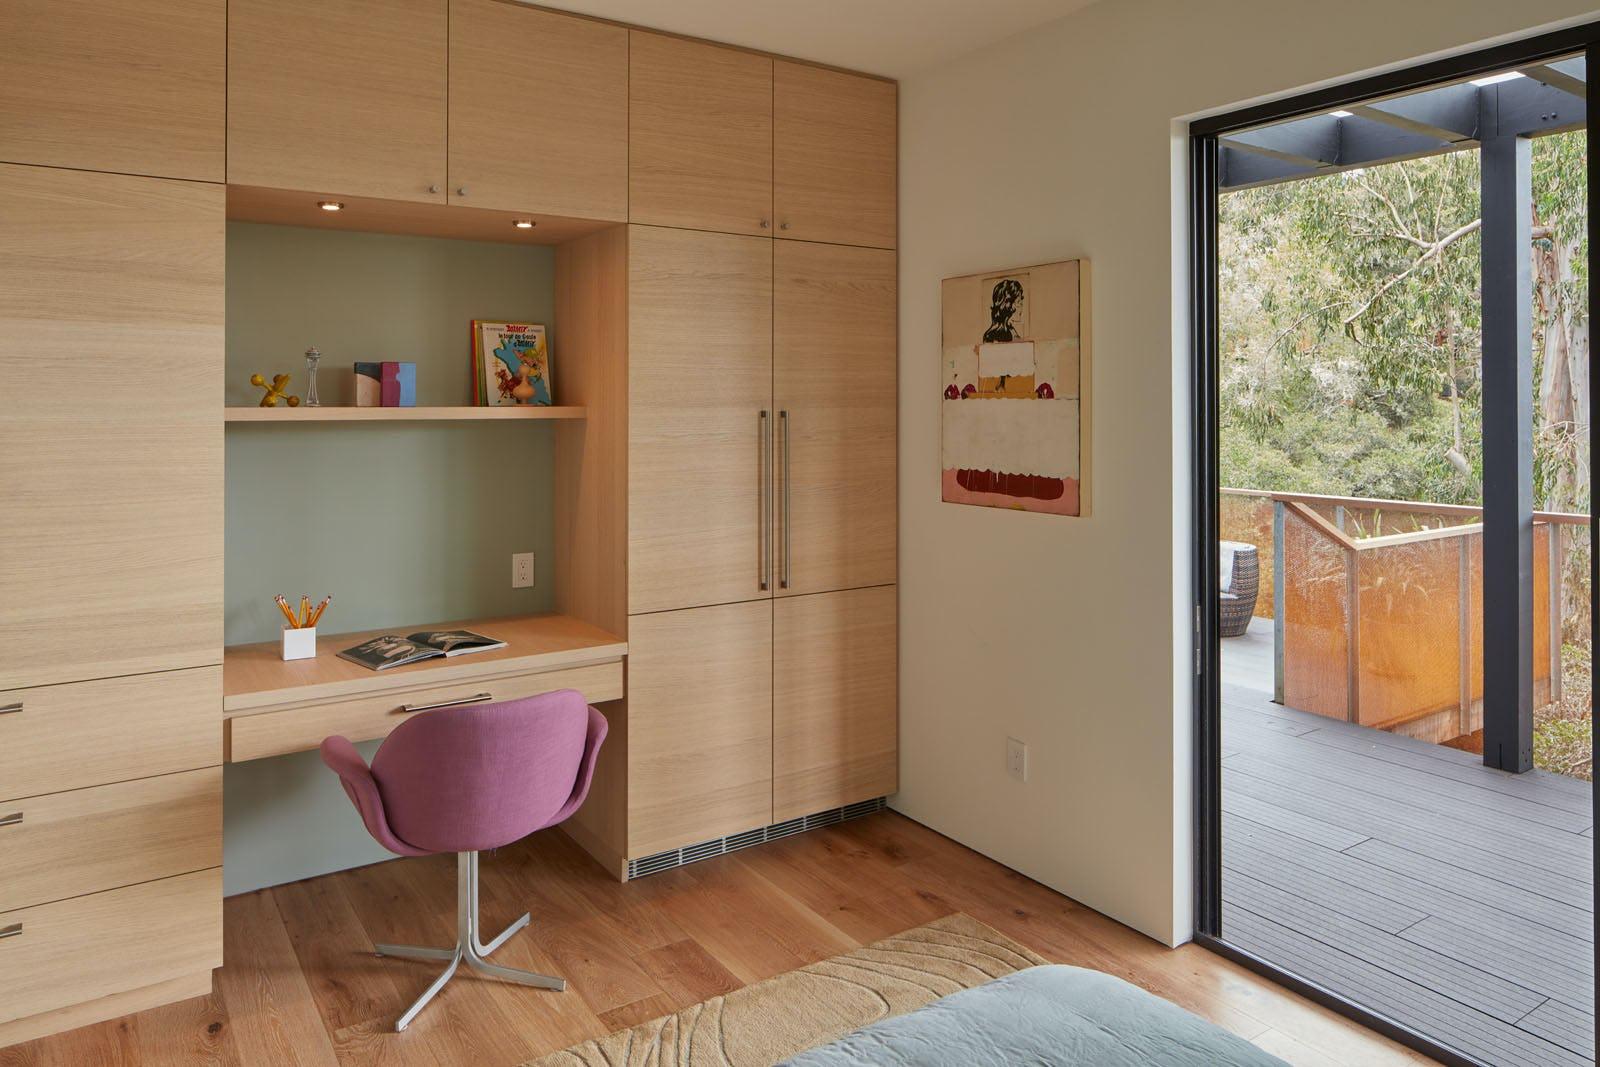 Builtform construction 441tamresidence desk doorway modern wood smaller